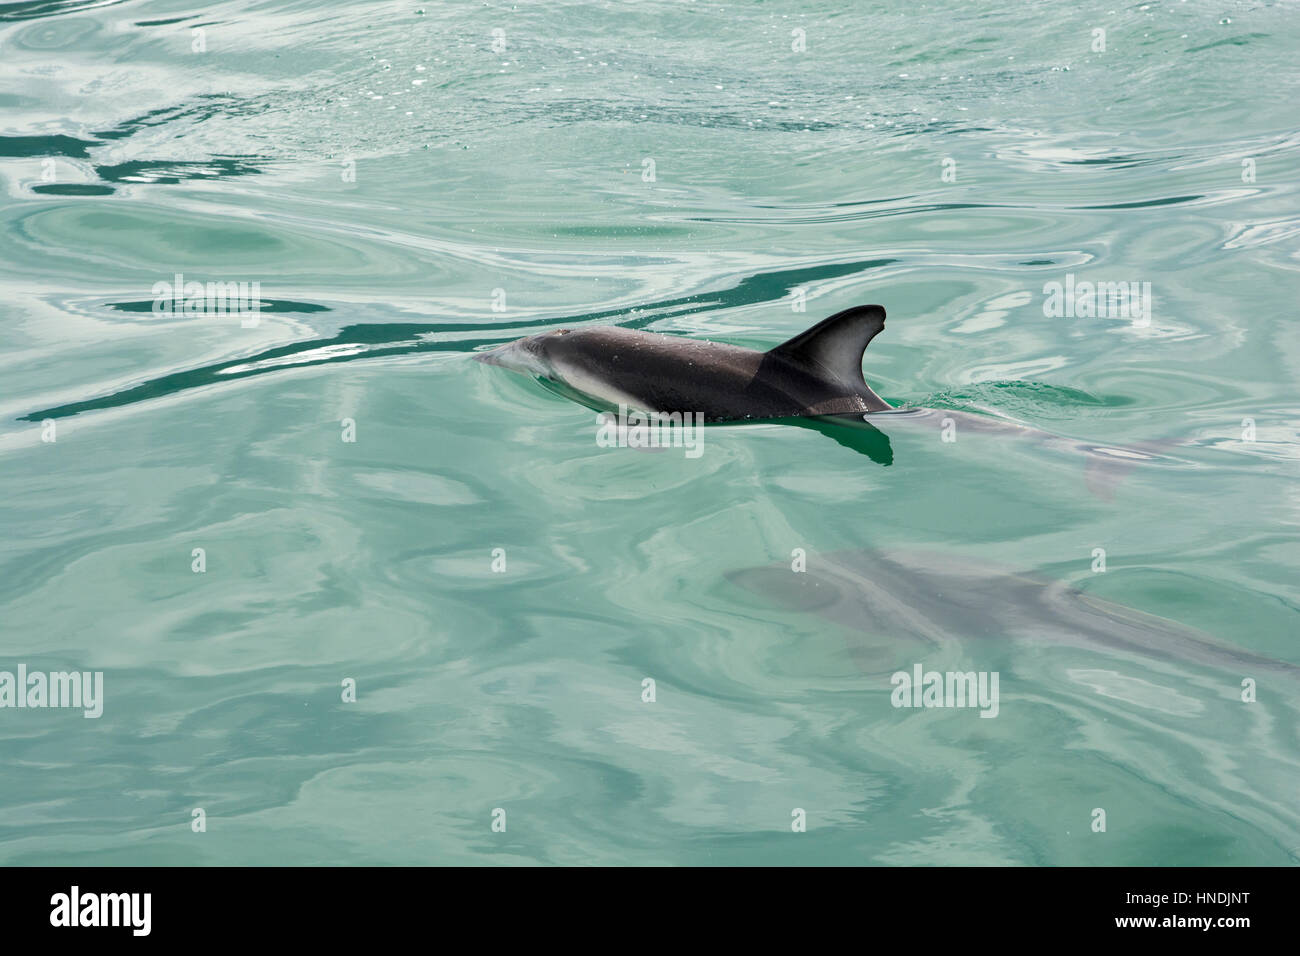 Dusky Dolphin swimming in the Pacific Ocean near Kaikoura in New Zealand.  Schwarzdelfine schwimmen im Pazifik in - Stock Image